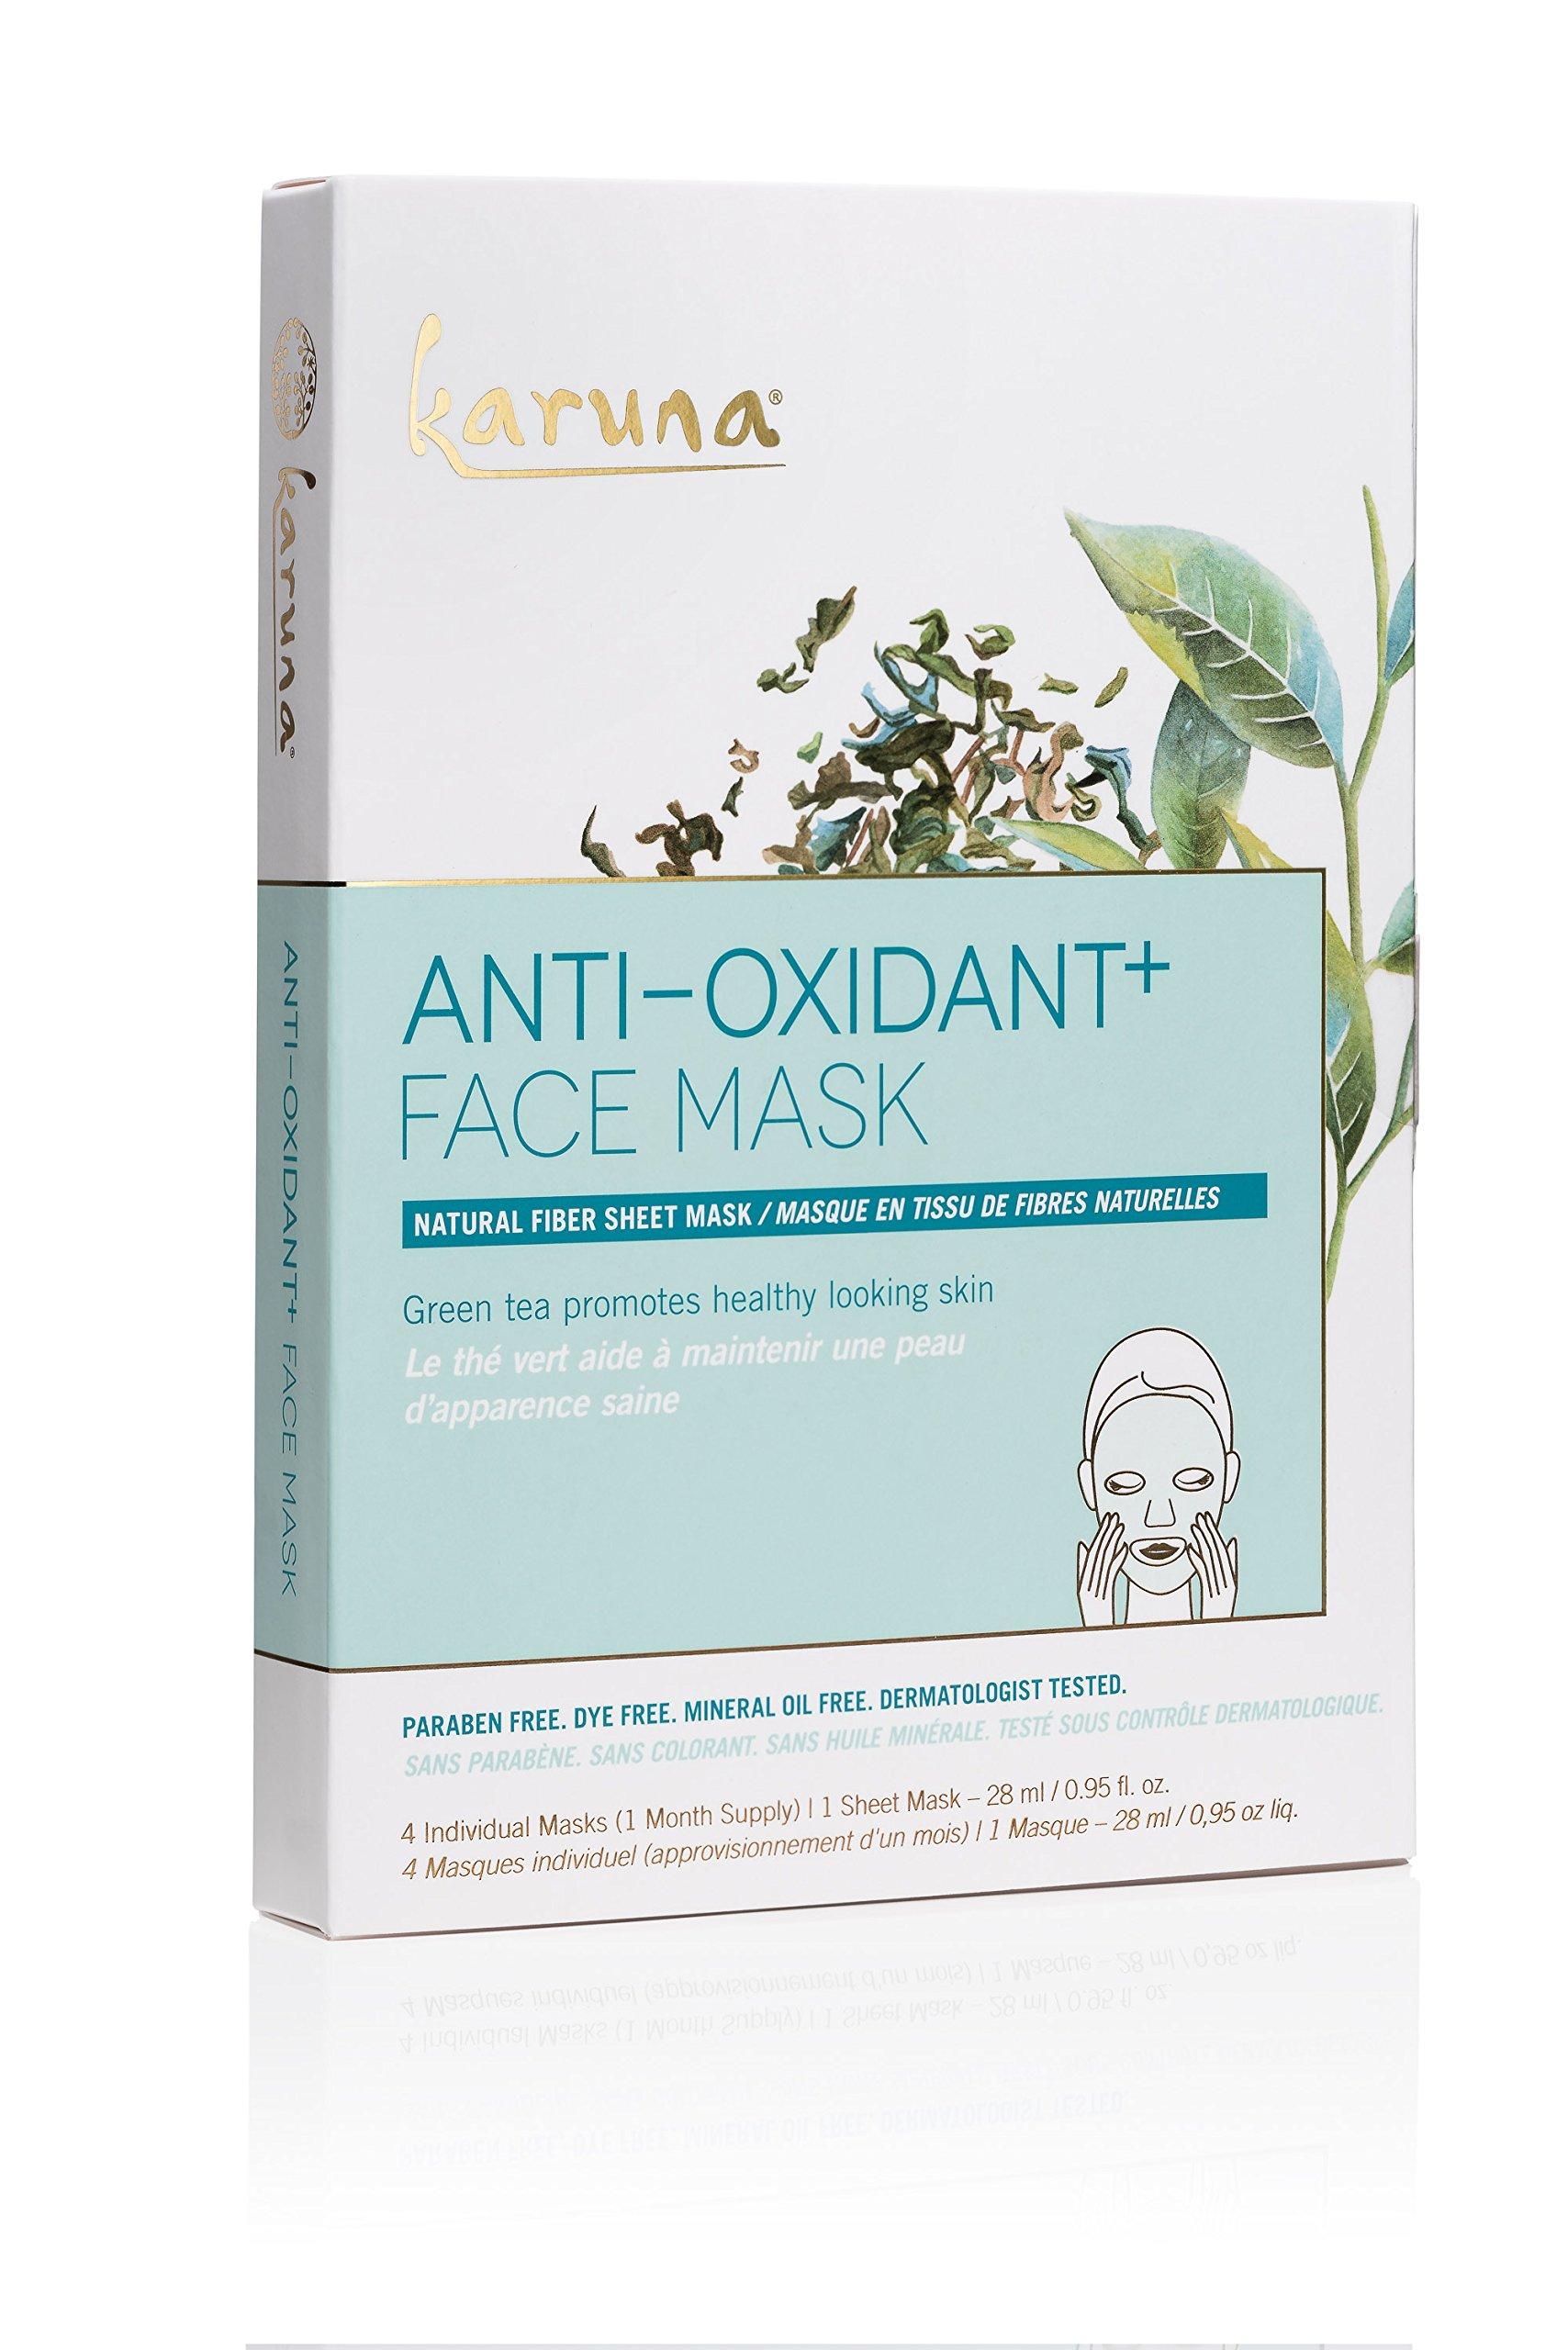 Karuna Anti-Oxidant + Face Mask